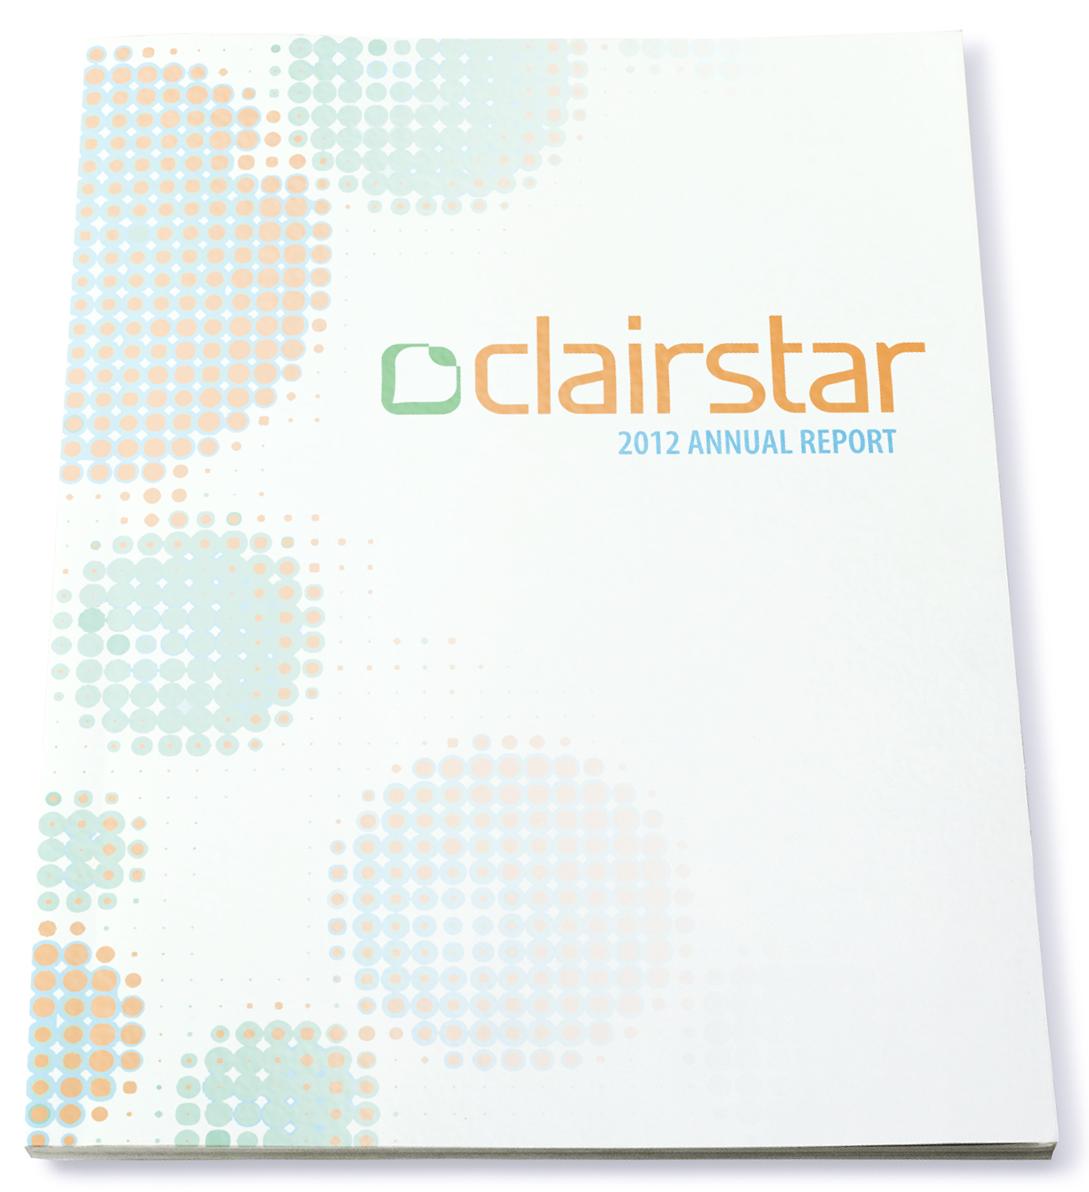 clairstar Annual Report